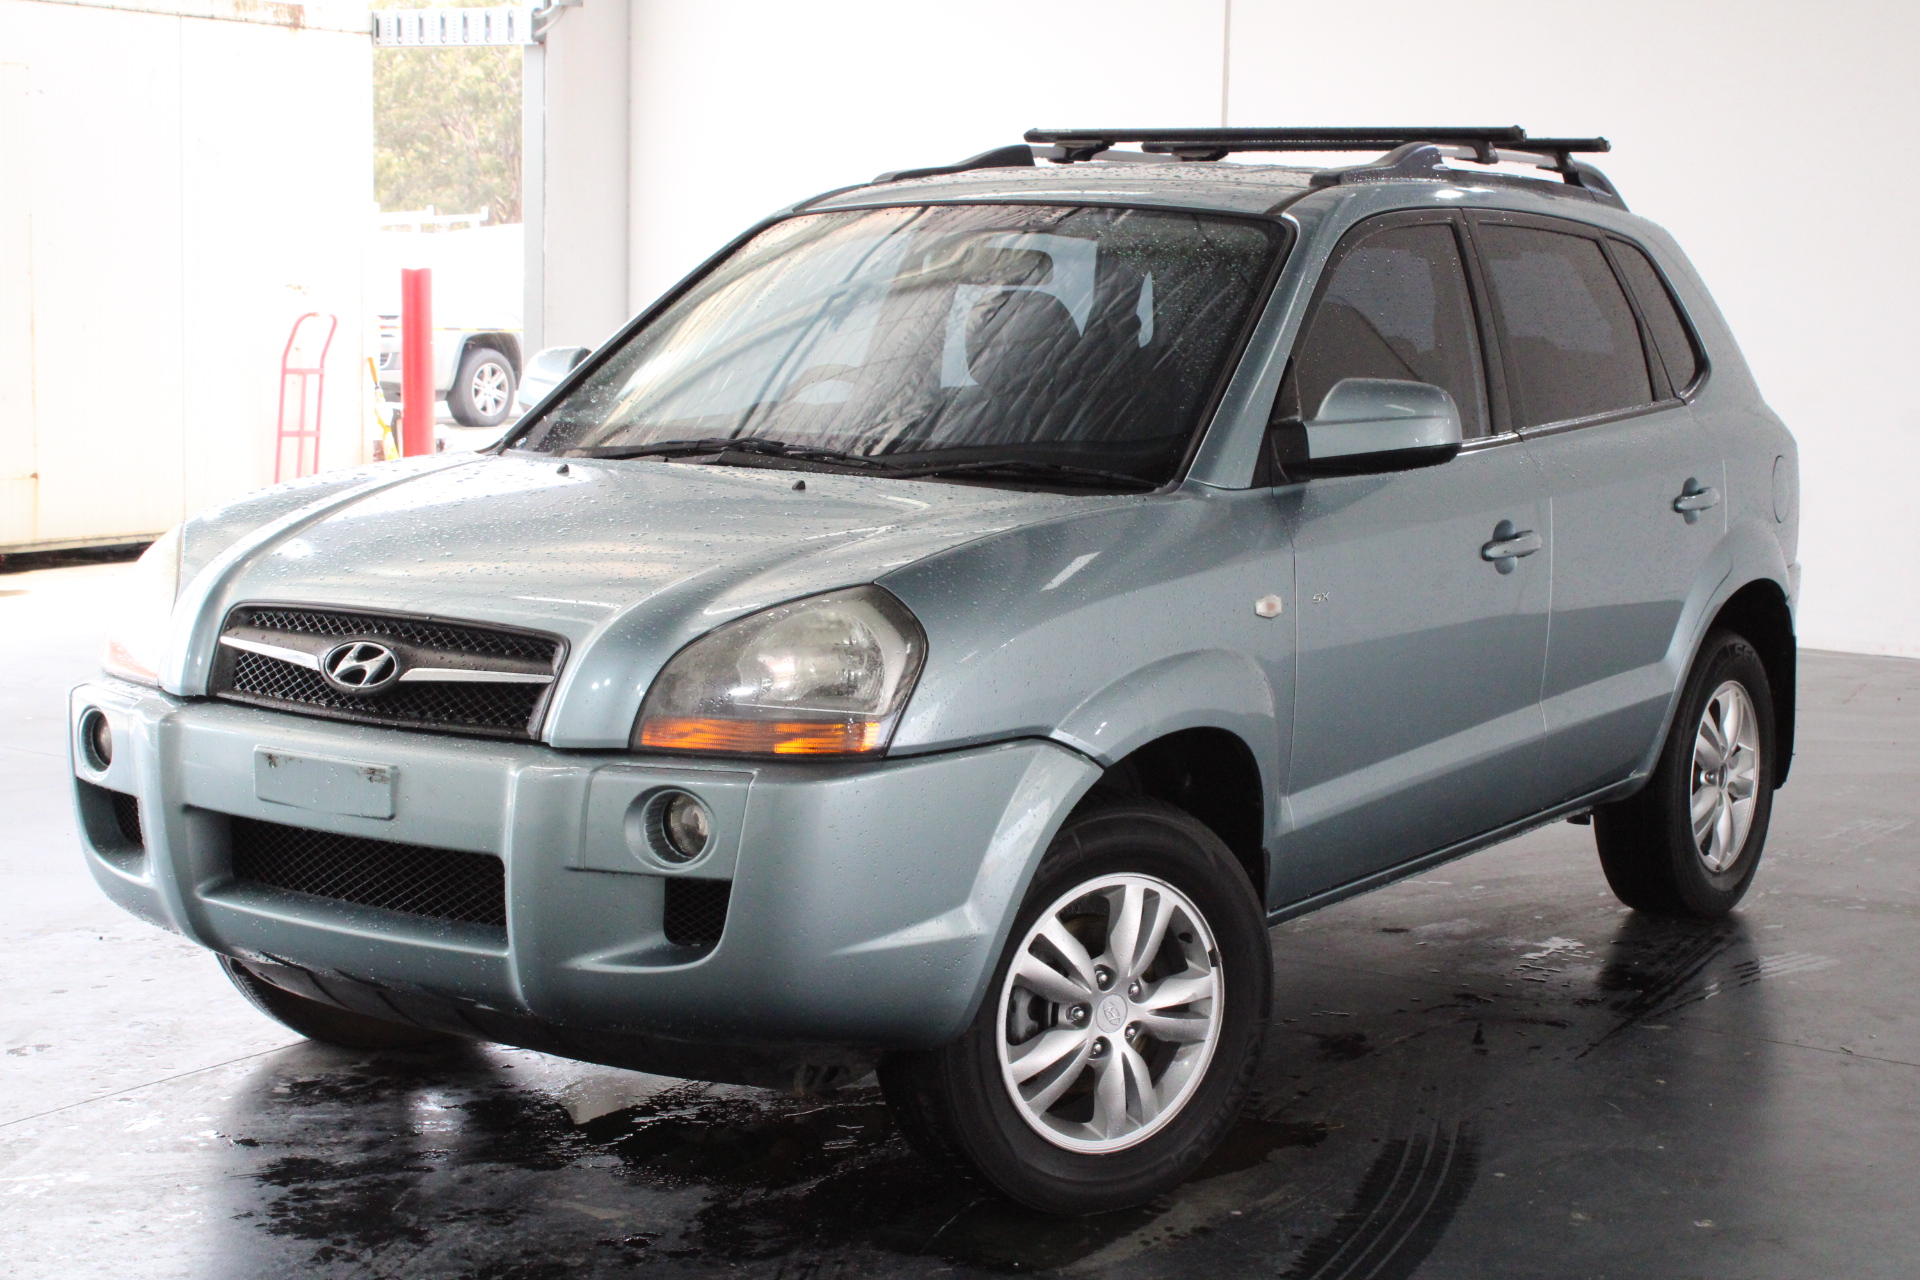 2008 Hyundai Tucson CITY SX Manual Wagon